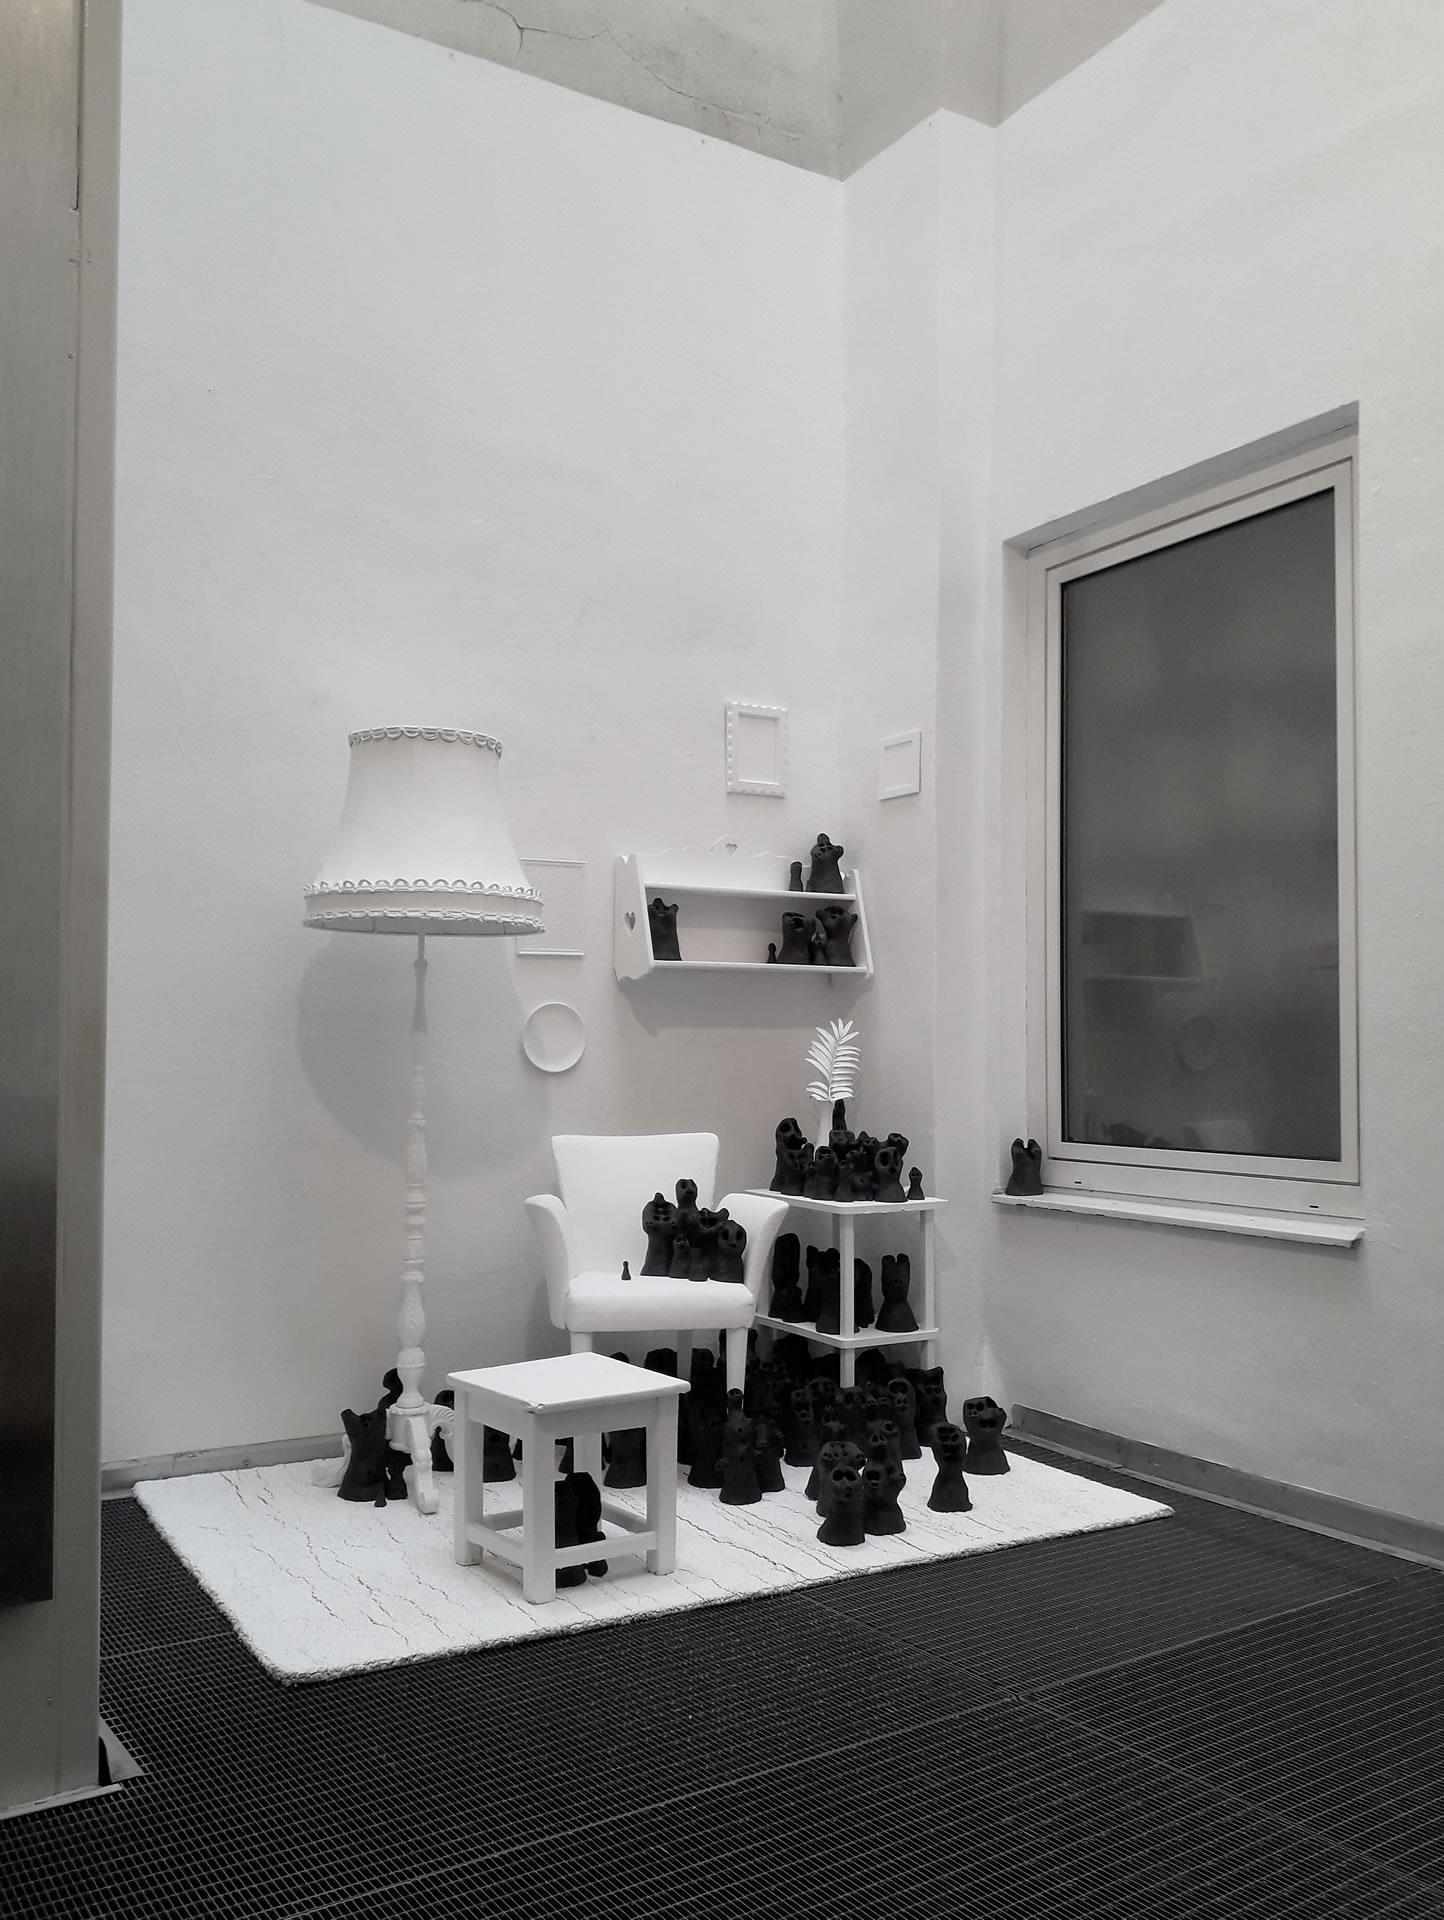 Franz Nigl | Foto Florian Reese | unheimlich heimelig | Galerie3